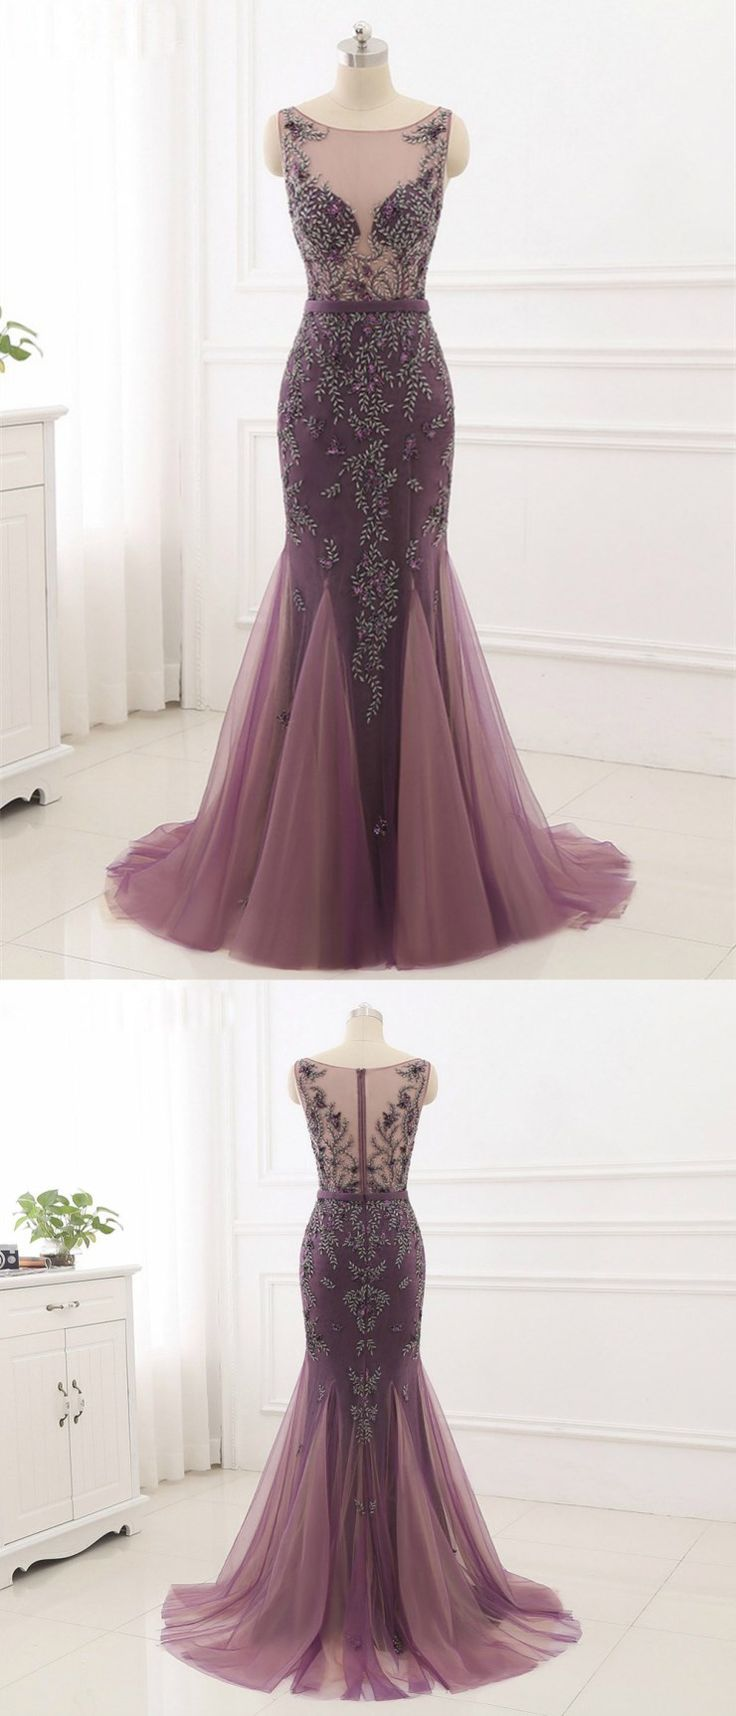 Mermaid Scoop-Neck Sweep Train Tulle Dusty Rose Prom Dresses With Rhine Stones ASD27097 #promdress #mermaid #dustyrose #vintage